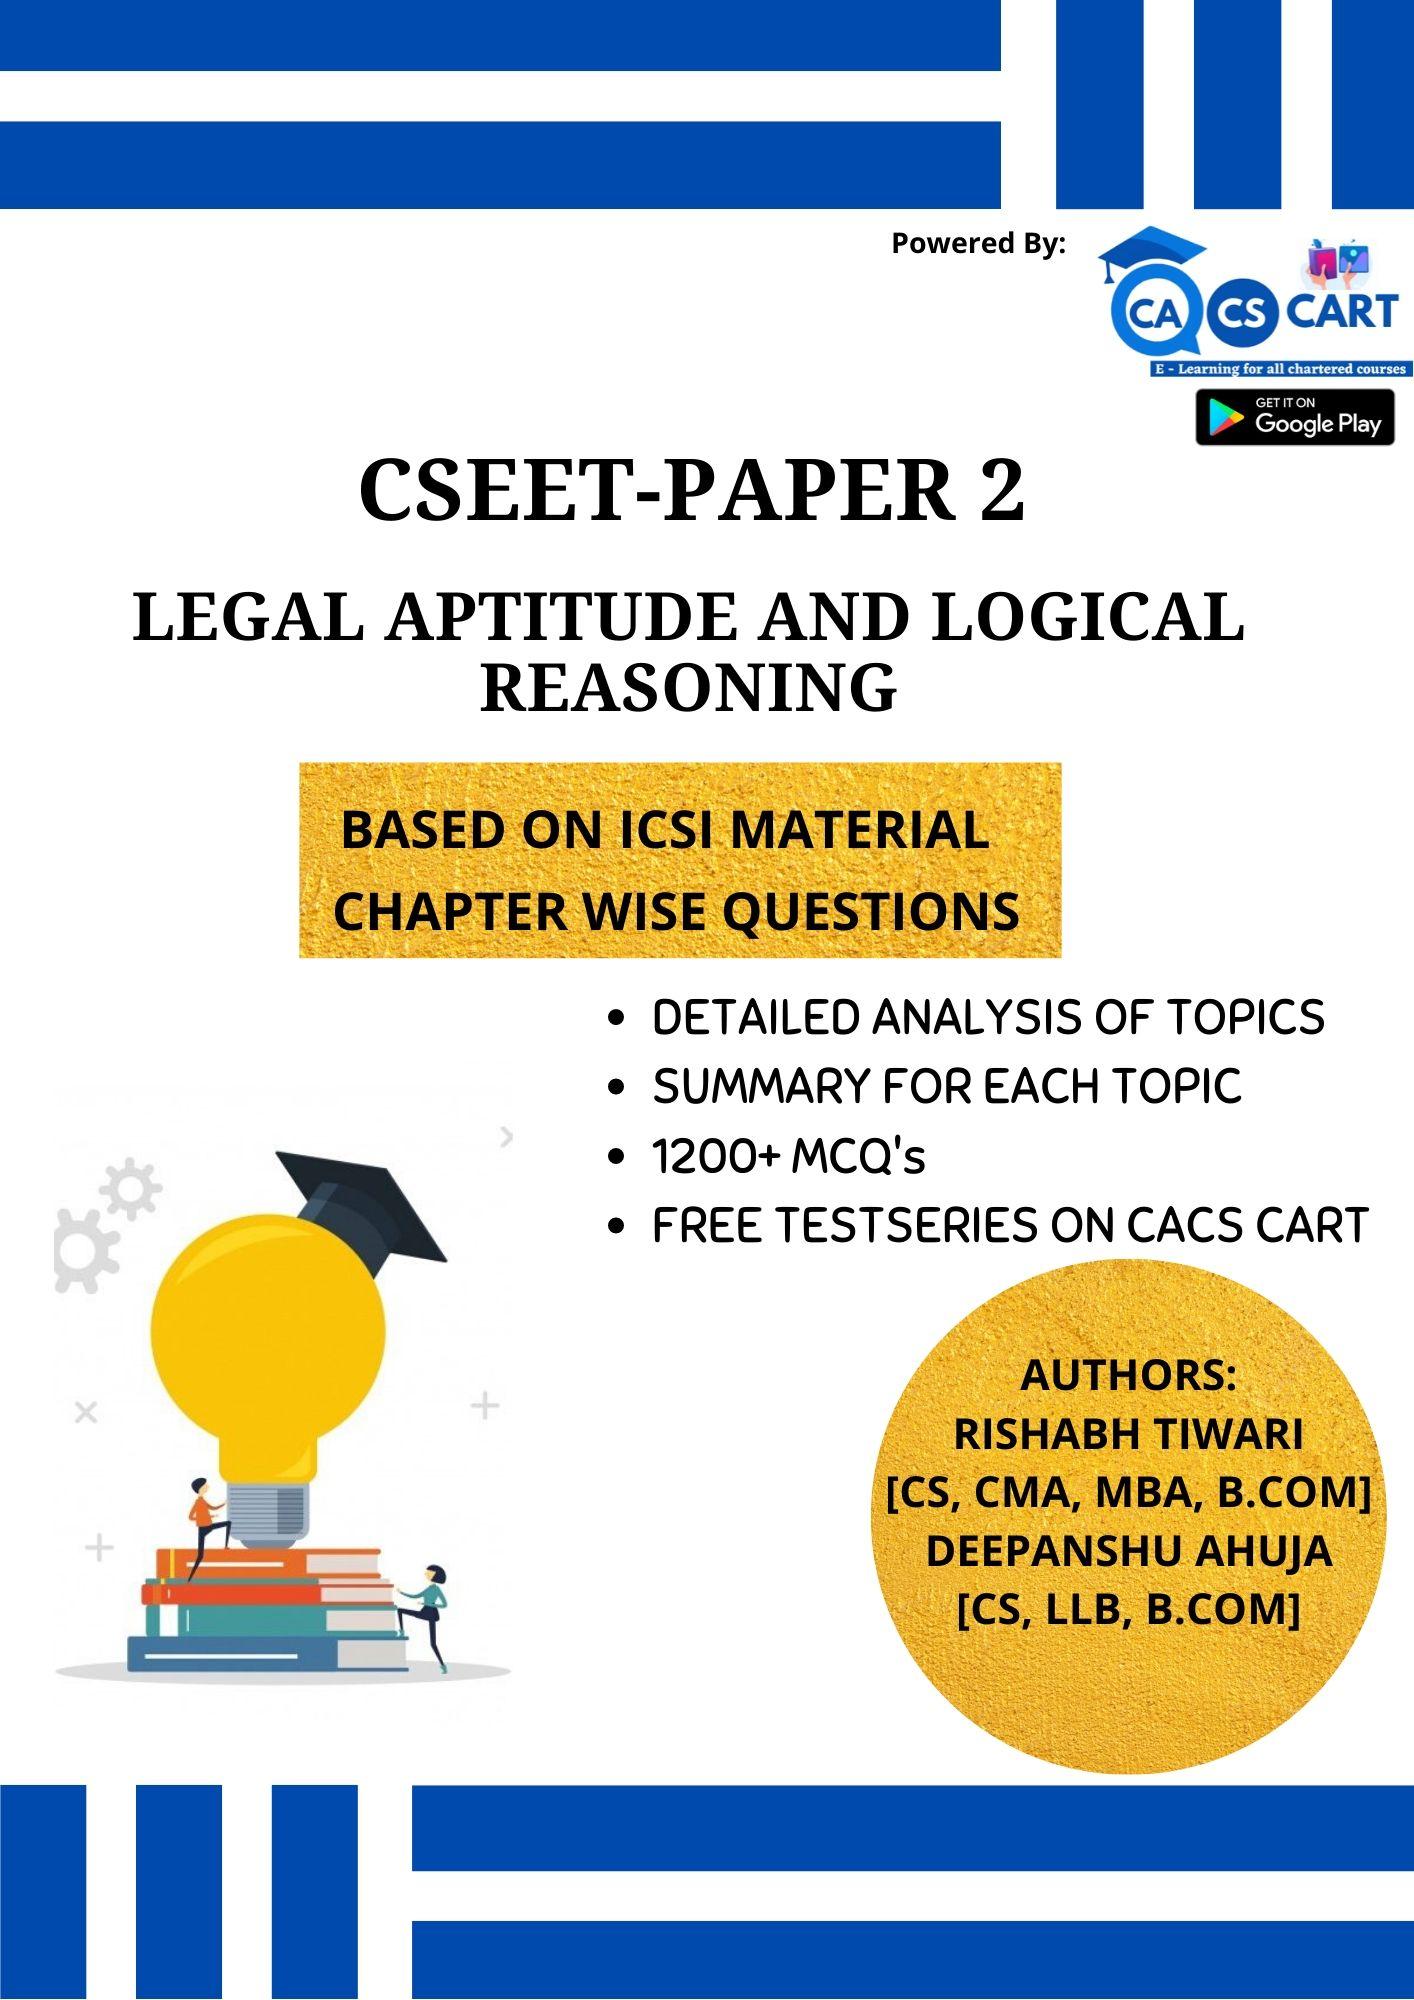 CSEET PAPER 2 - Legal Aptitude and Logical Reasoning